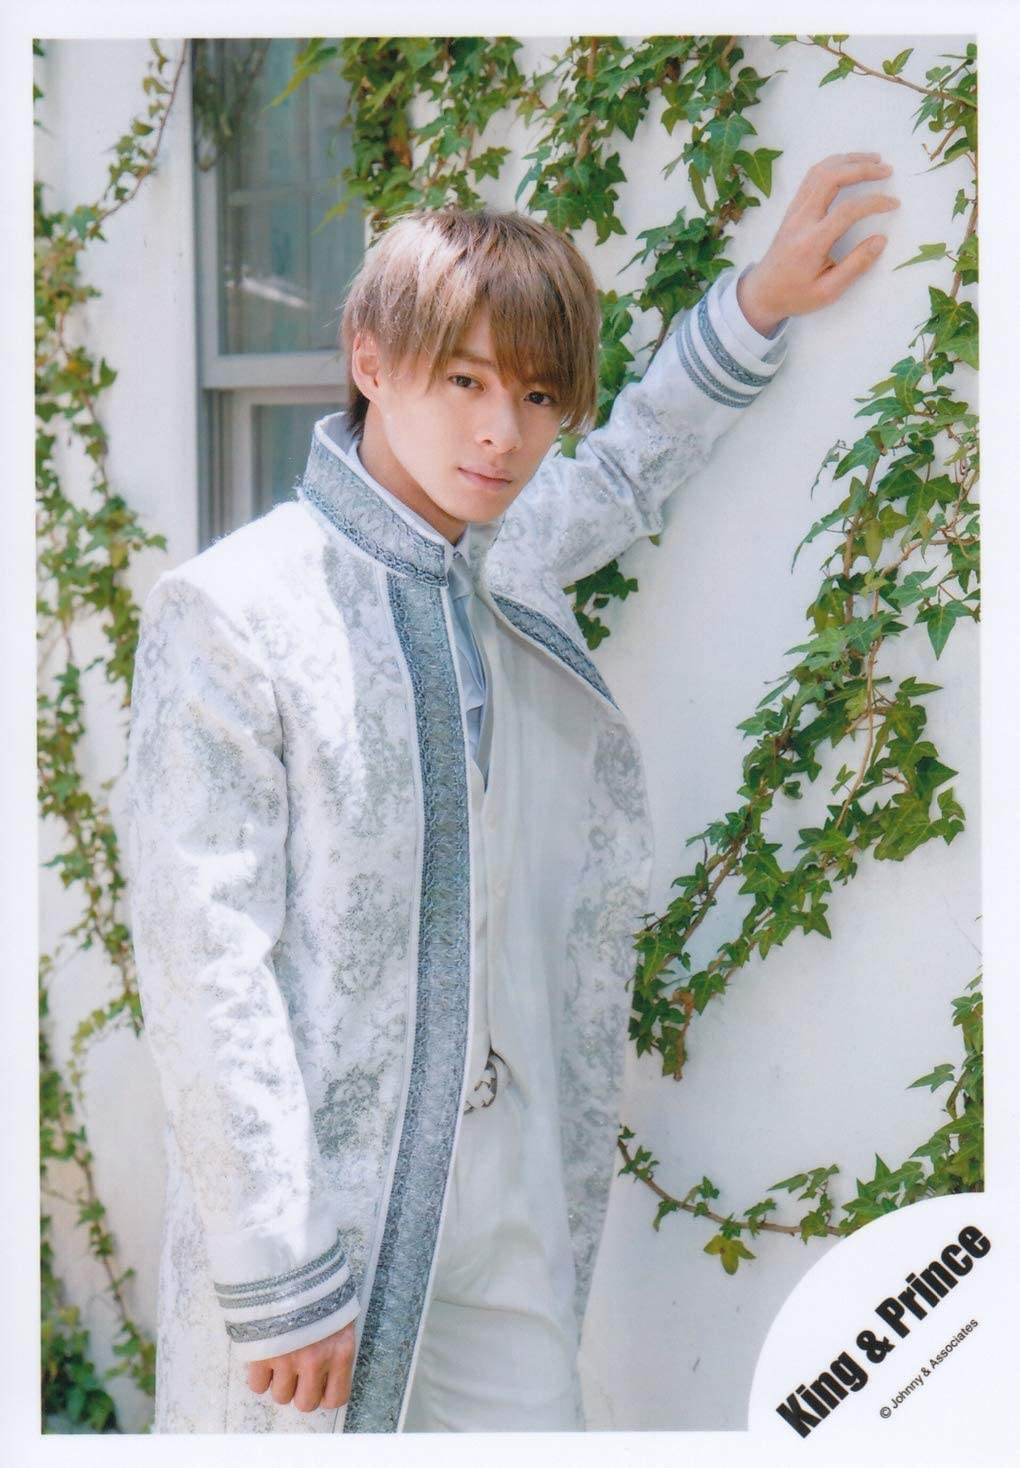 Amazon King Prince 公式 生 写真 平野紫耀 Kp00184 アイドル